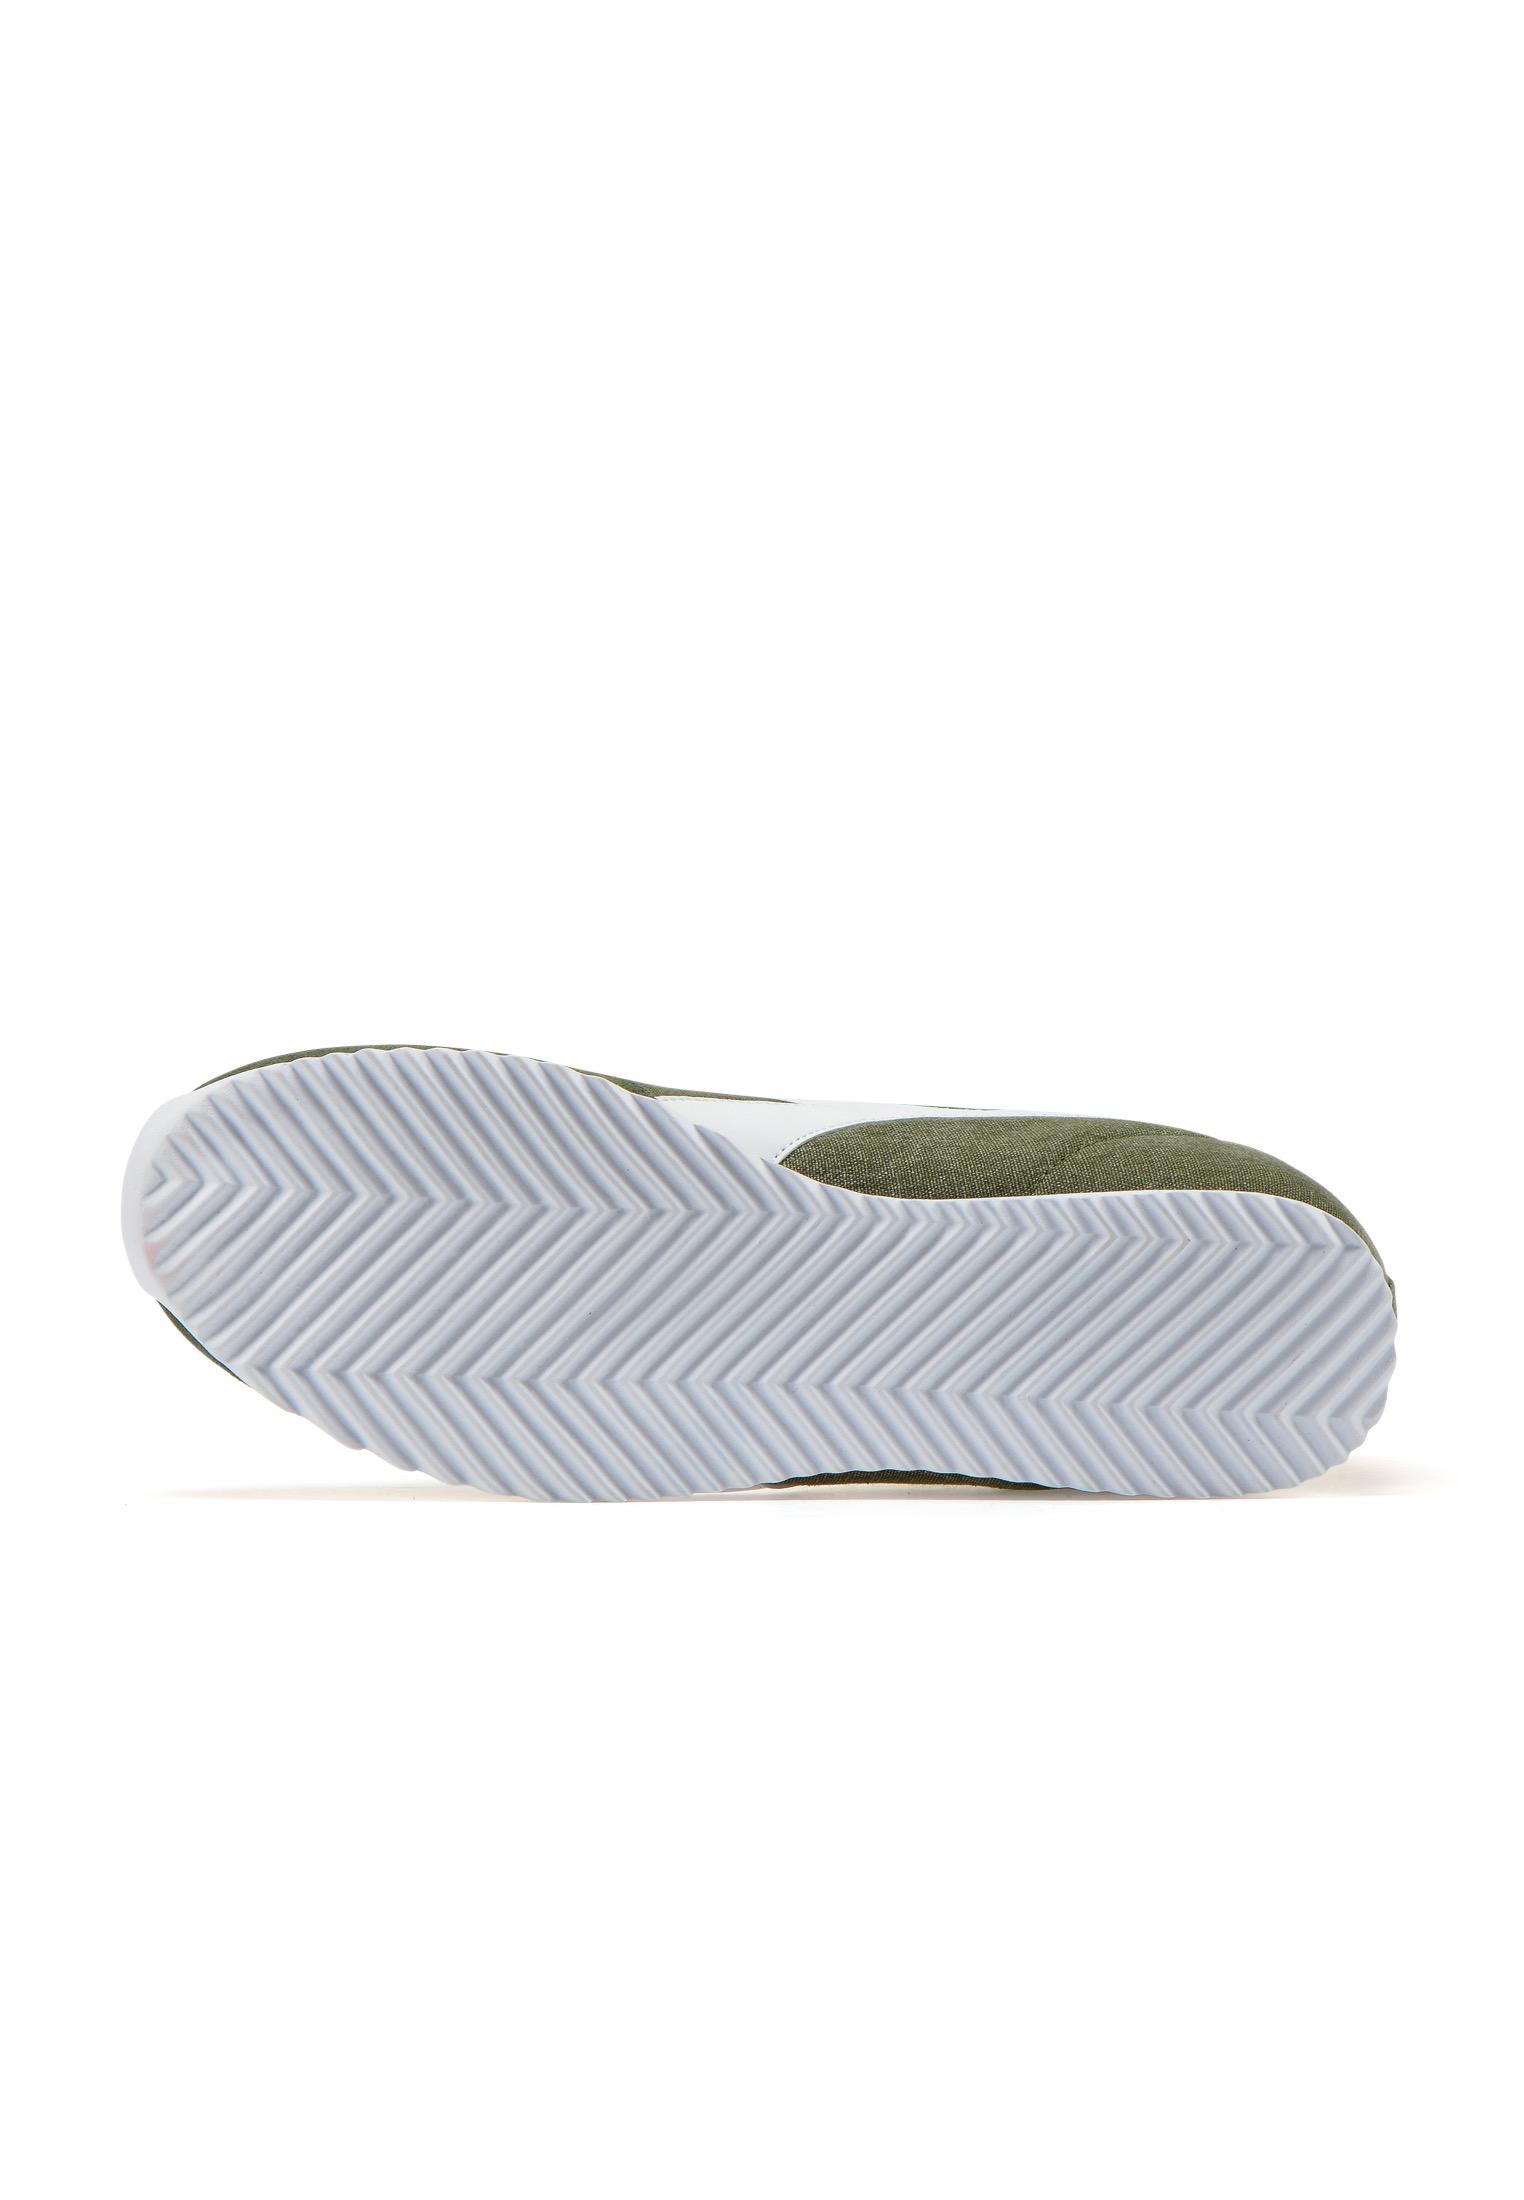 Scarpe-Diadora-Jog-Light-C-Sneakers-sportive-uomo-donna-vari-colori-e-taglie miniatura 40